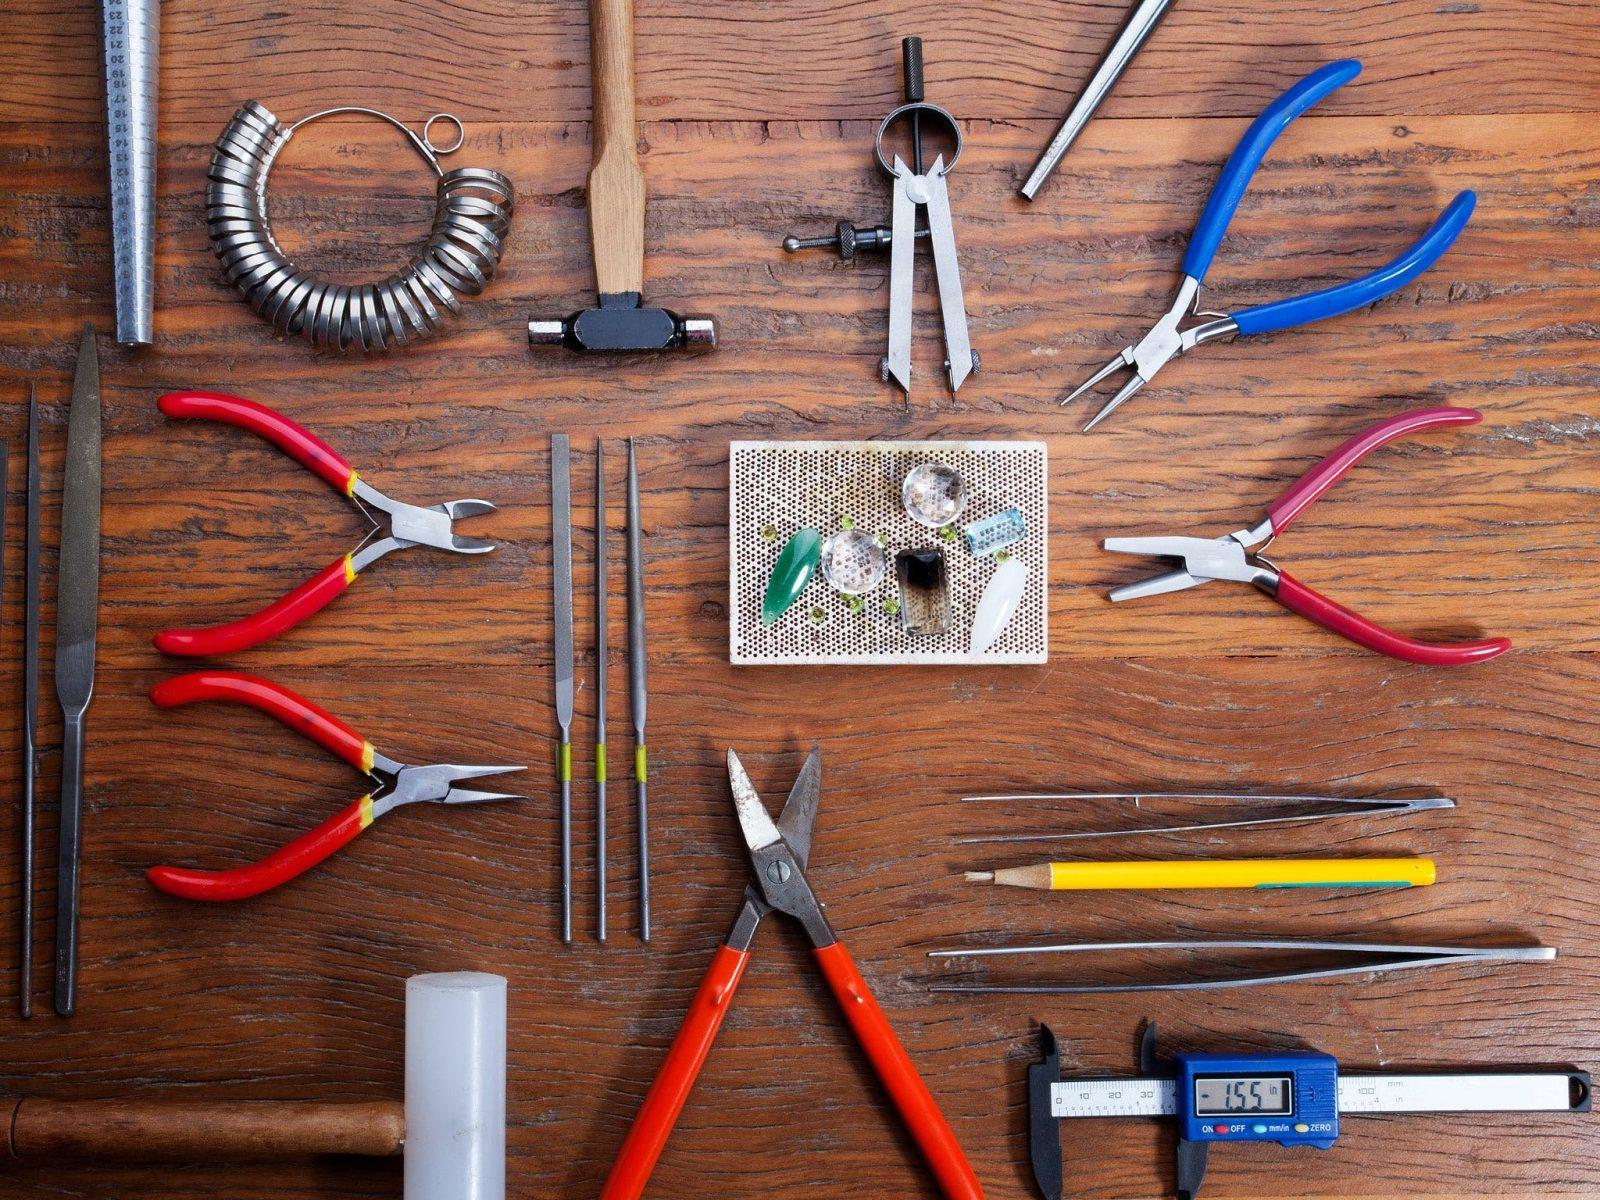 Jewellers Tools - Intensive Beginners Jewellery Making Short Course | Pod Jewellery